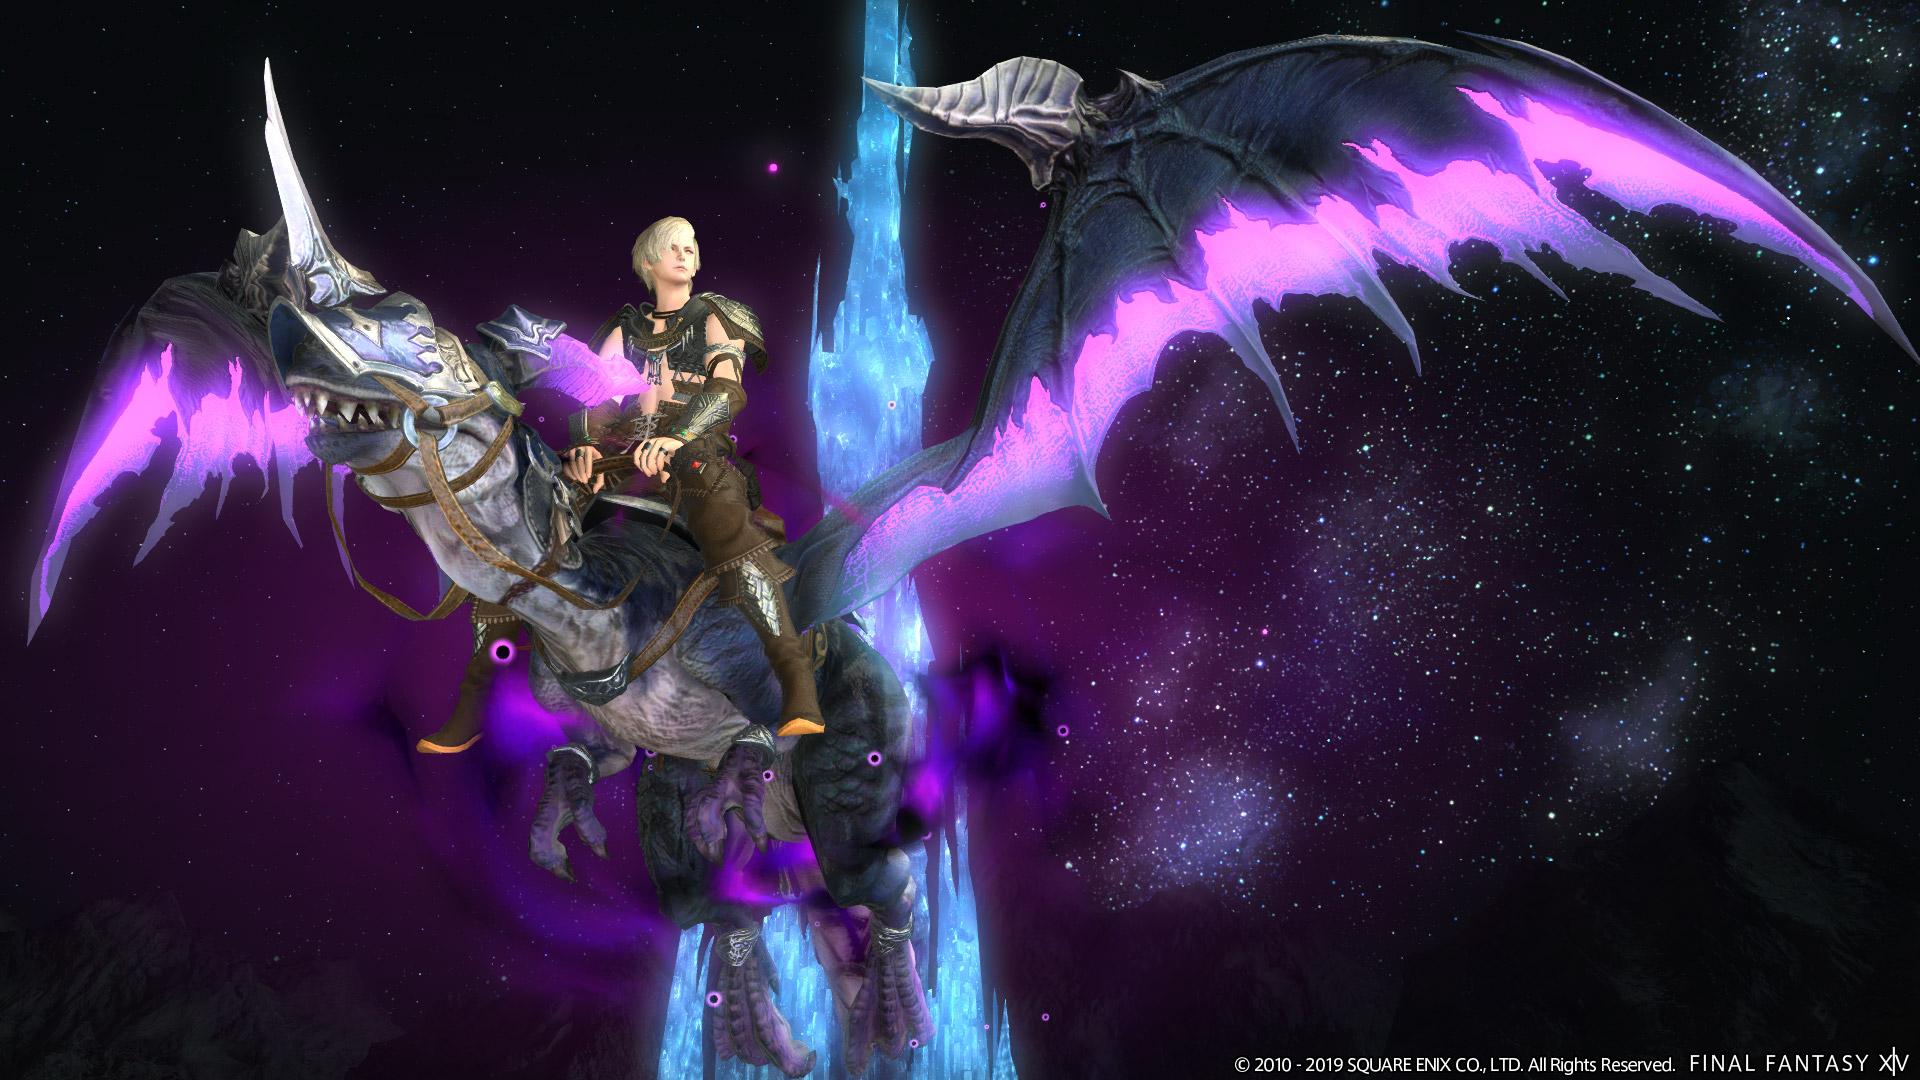 Final Fantasy XIV Patch 5.15 New Mounts